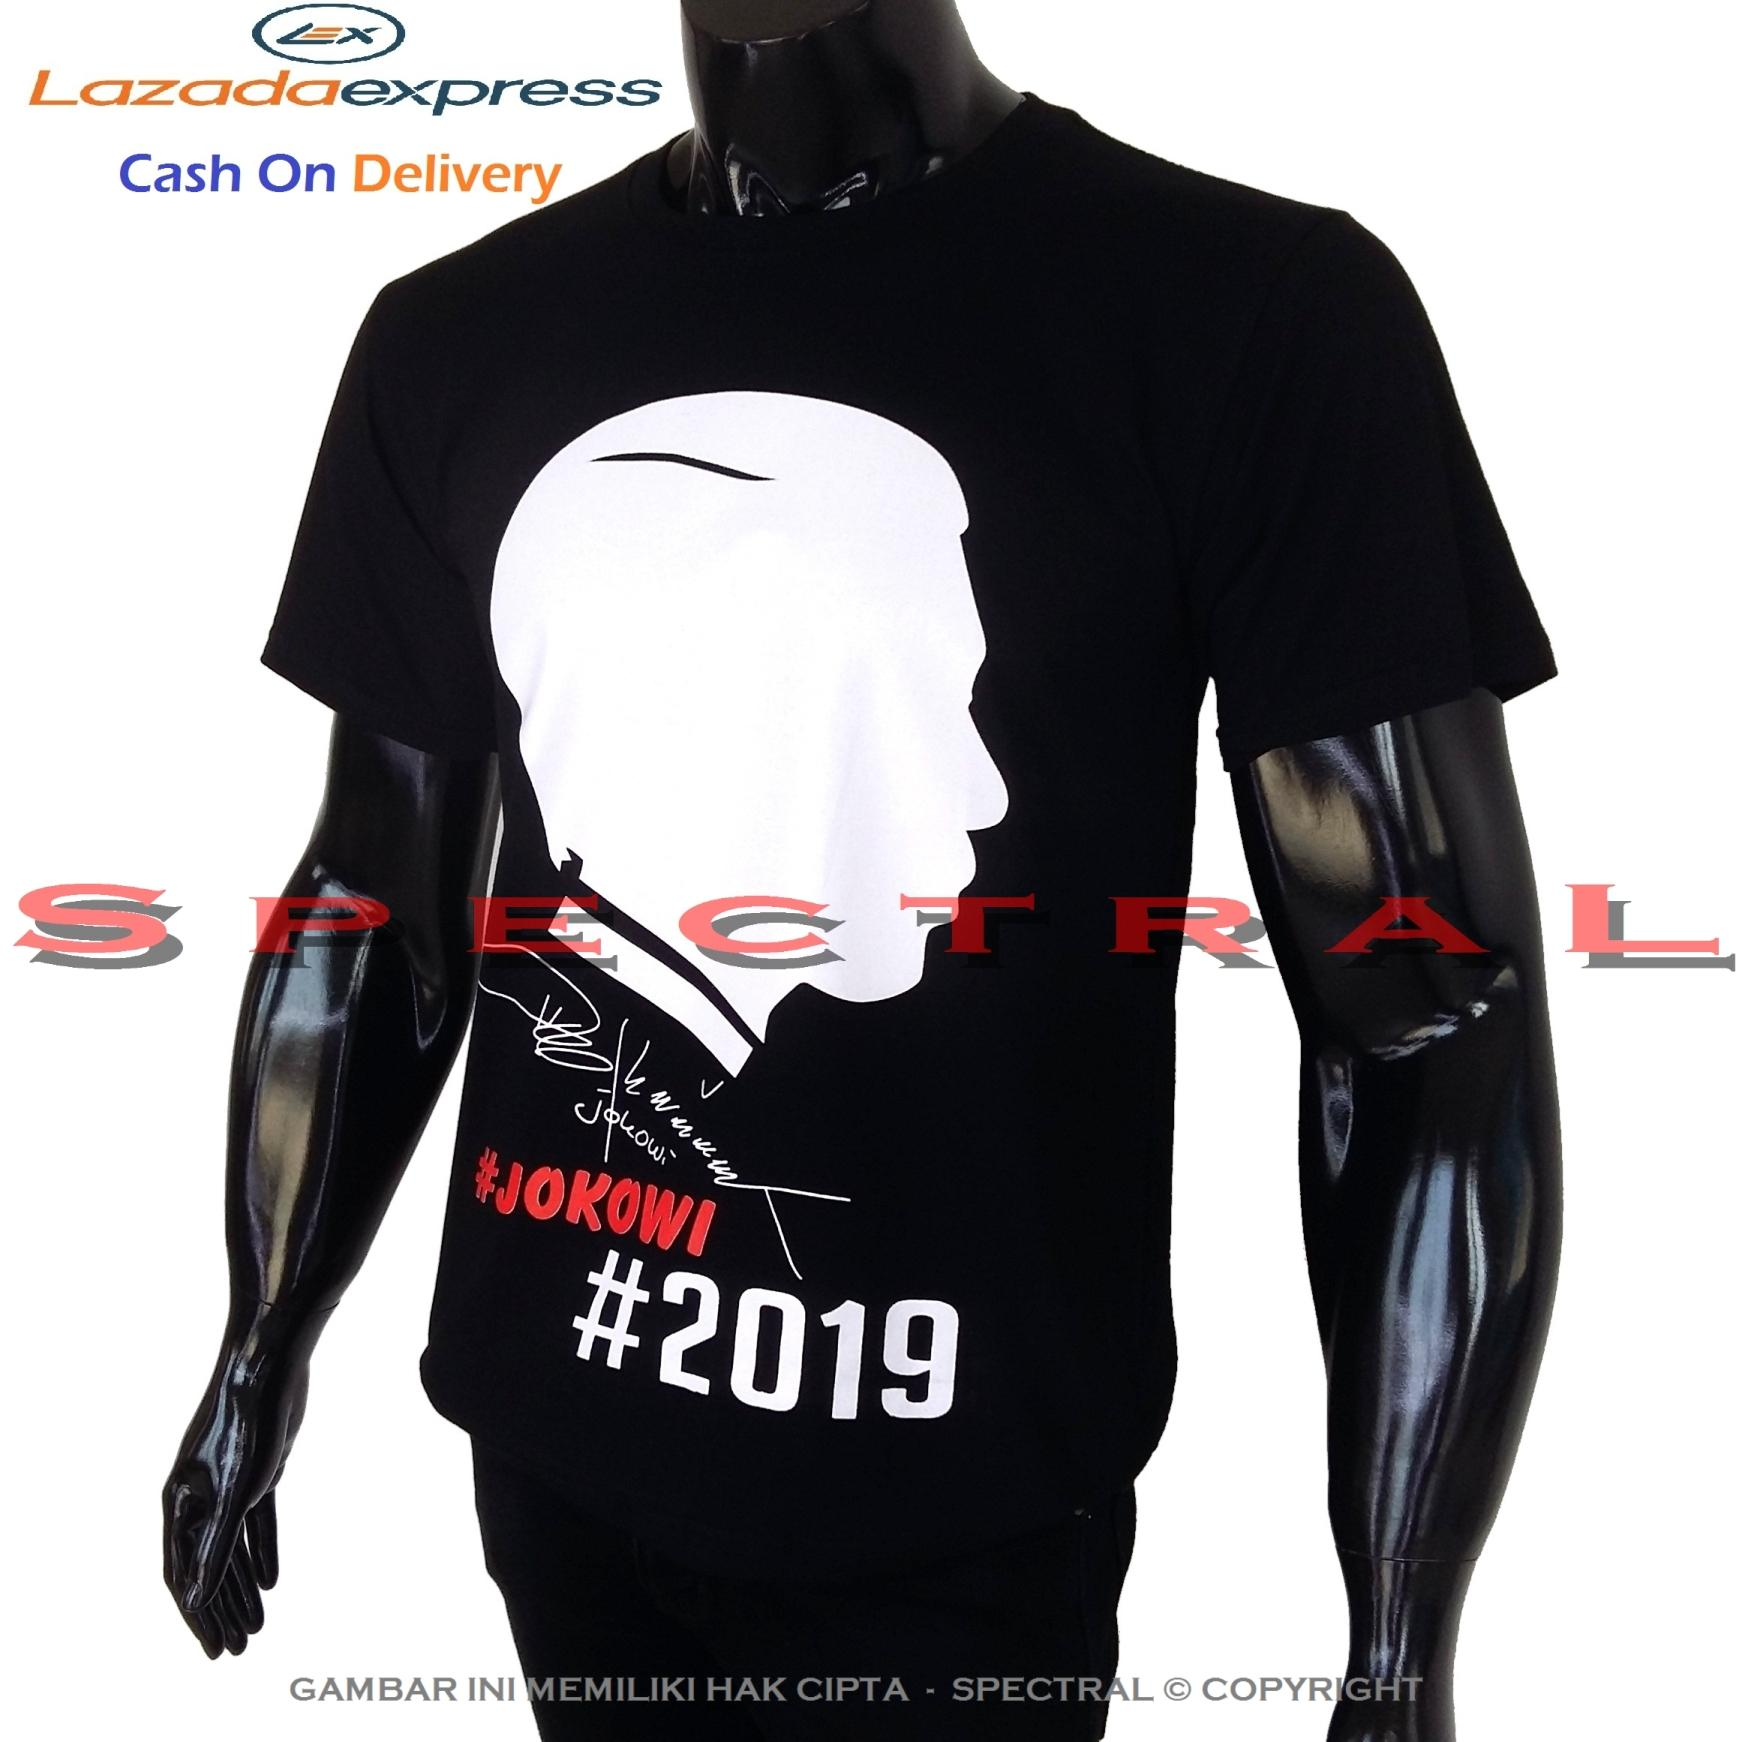 Spectral – #2019 Jokowi 100% Cotton Combed Salam 2 Periode GANTI PRESIDEN Kaos Distro Fashion T-Shirt Baju Pakaian #ganti Pria Wanita Cewe Cowo Lengan Murah Keren #gantipresiden2019 #gantipresiden Tulisan Kata-Kata kata Gantipresiden Indonesia Tagar 2019